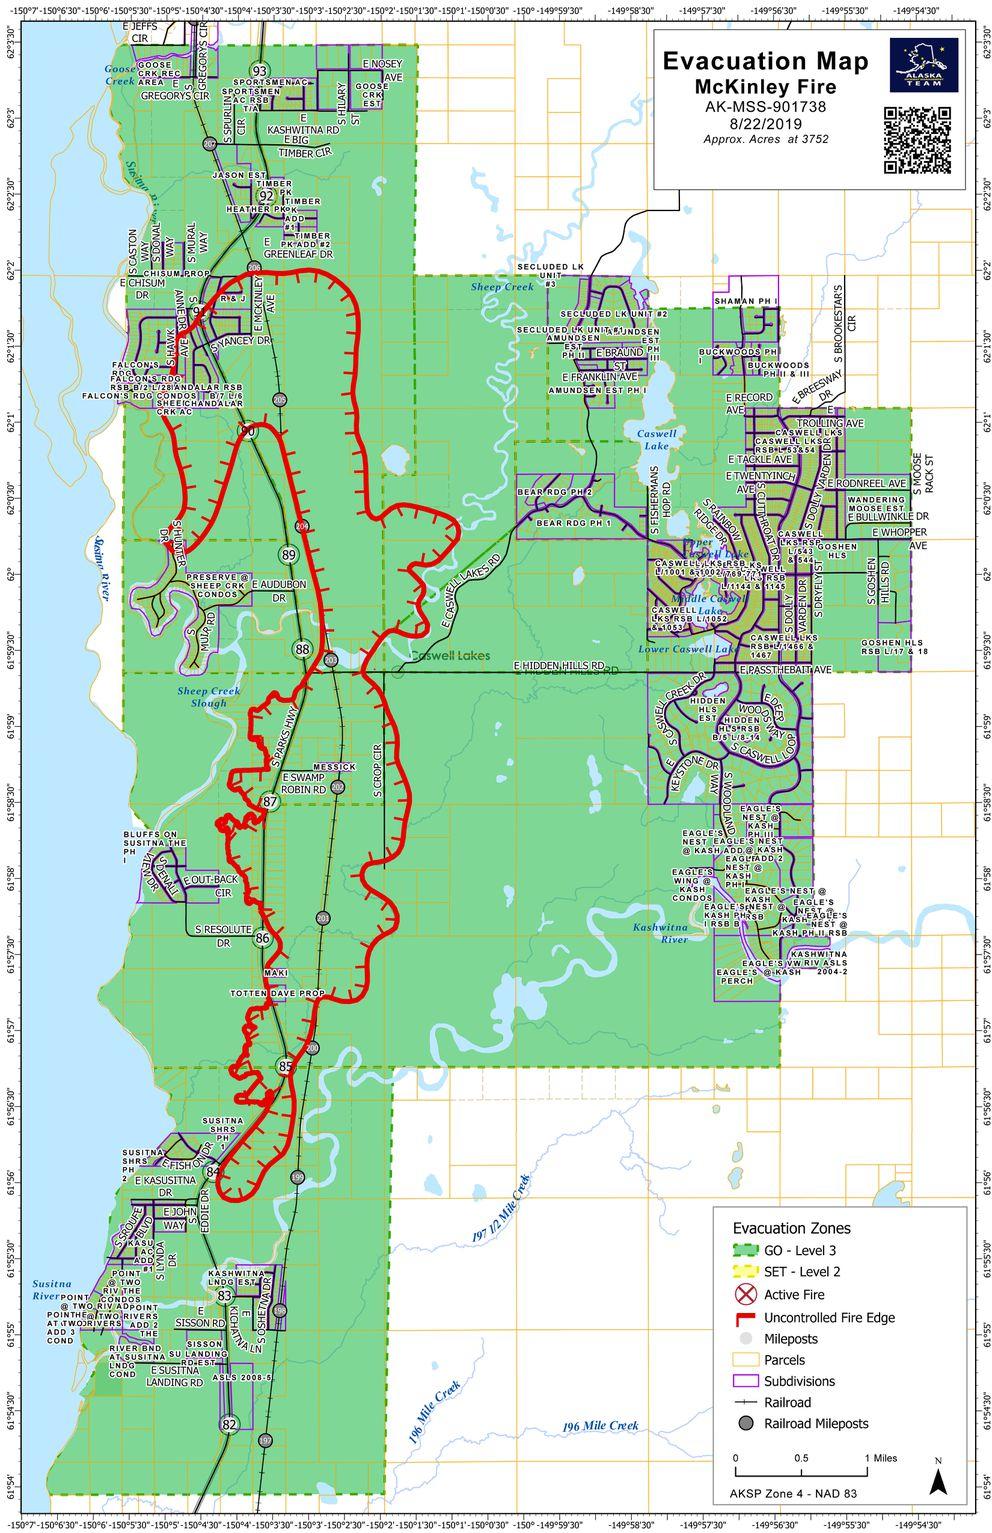 McKinley fire perimeter map as of Thursday afternoon, Aug. 22, 2019. (Courtesy Matanuska-Susitna Borough)